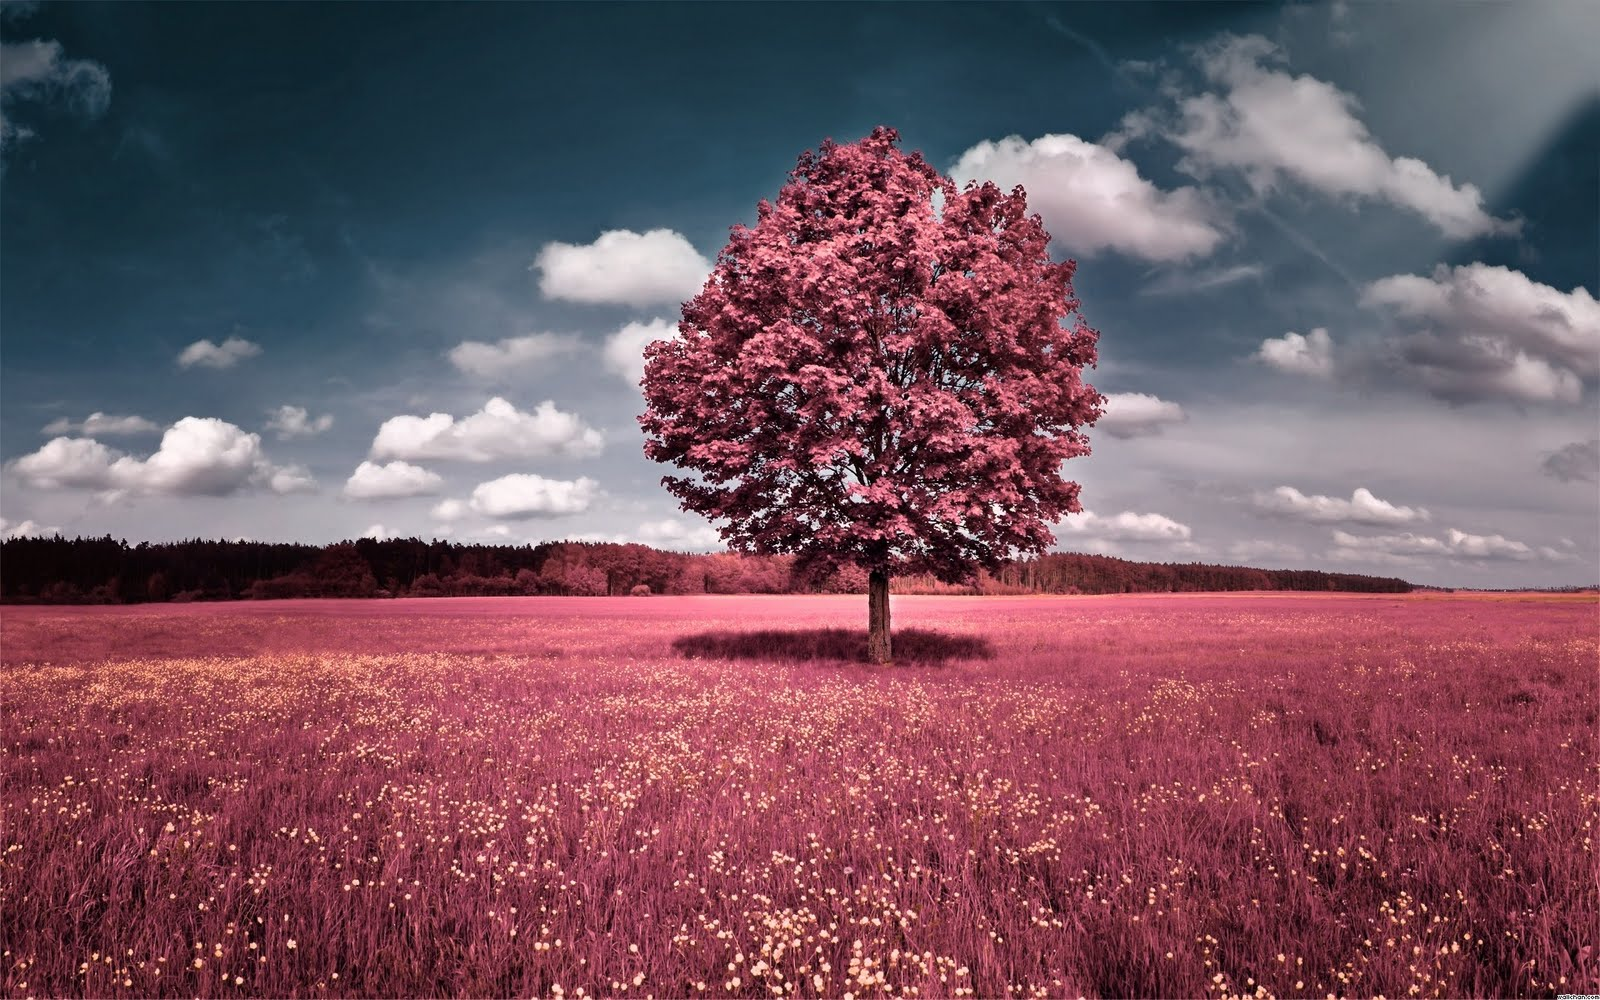 http://2.bp.blogspot.com/-t5xuf4_4YiM/Tj5IcztaI1I/AAAAAAAACc8/kBwplqY-sms/s1600/1305895965-clouds-trees-sky-flowers-pink-grass-fields-hills-wallpaper.jpg